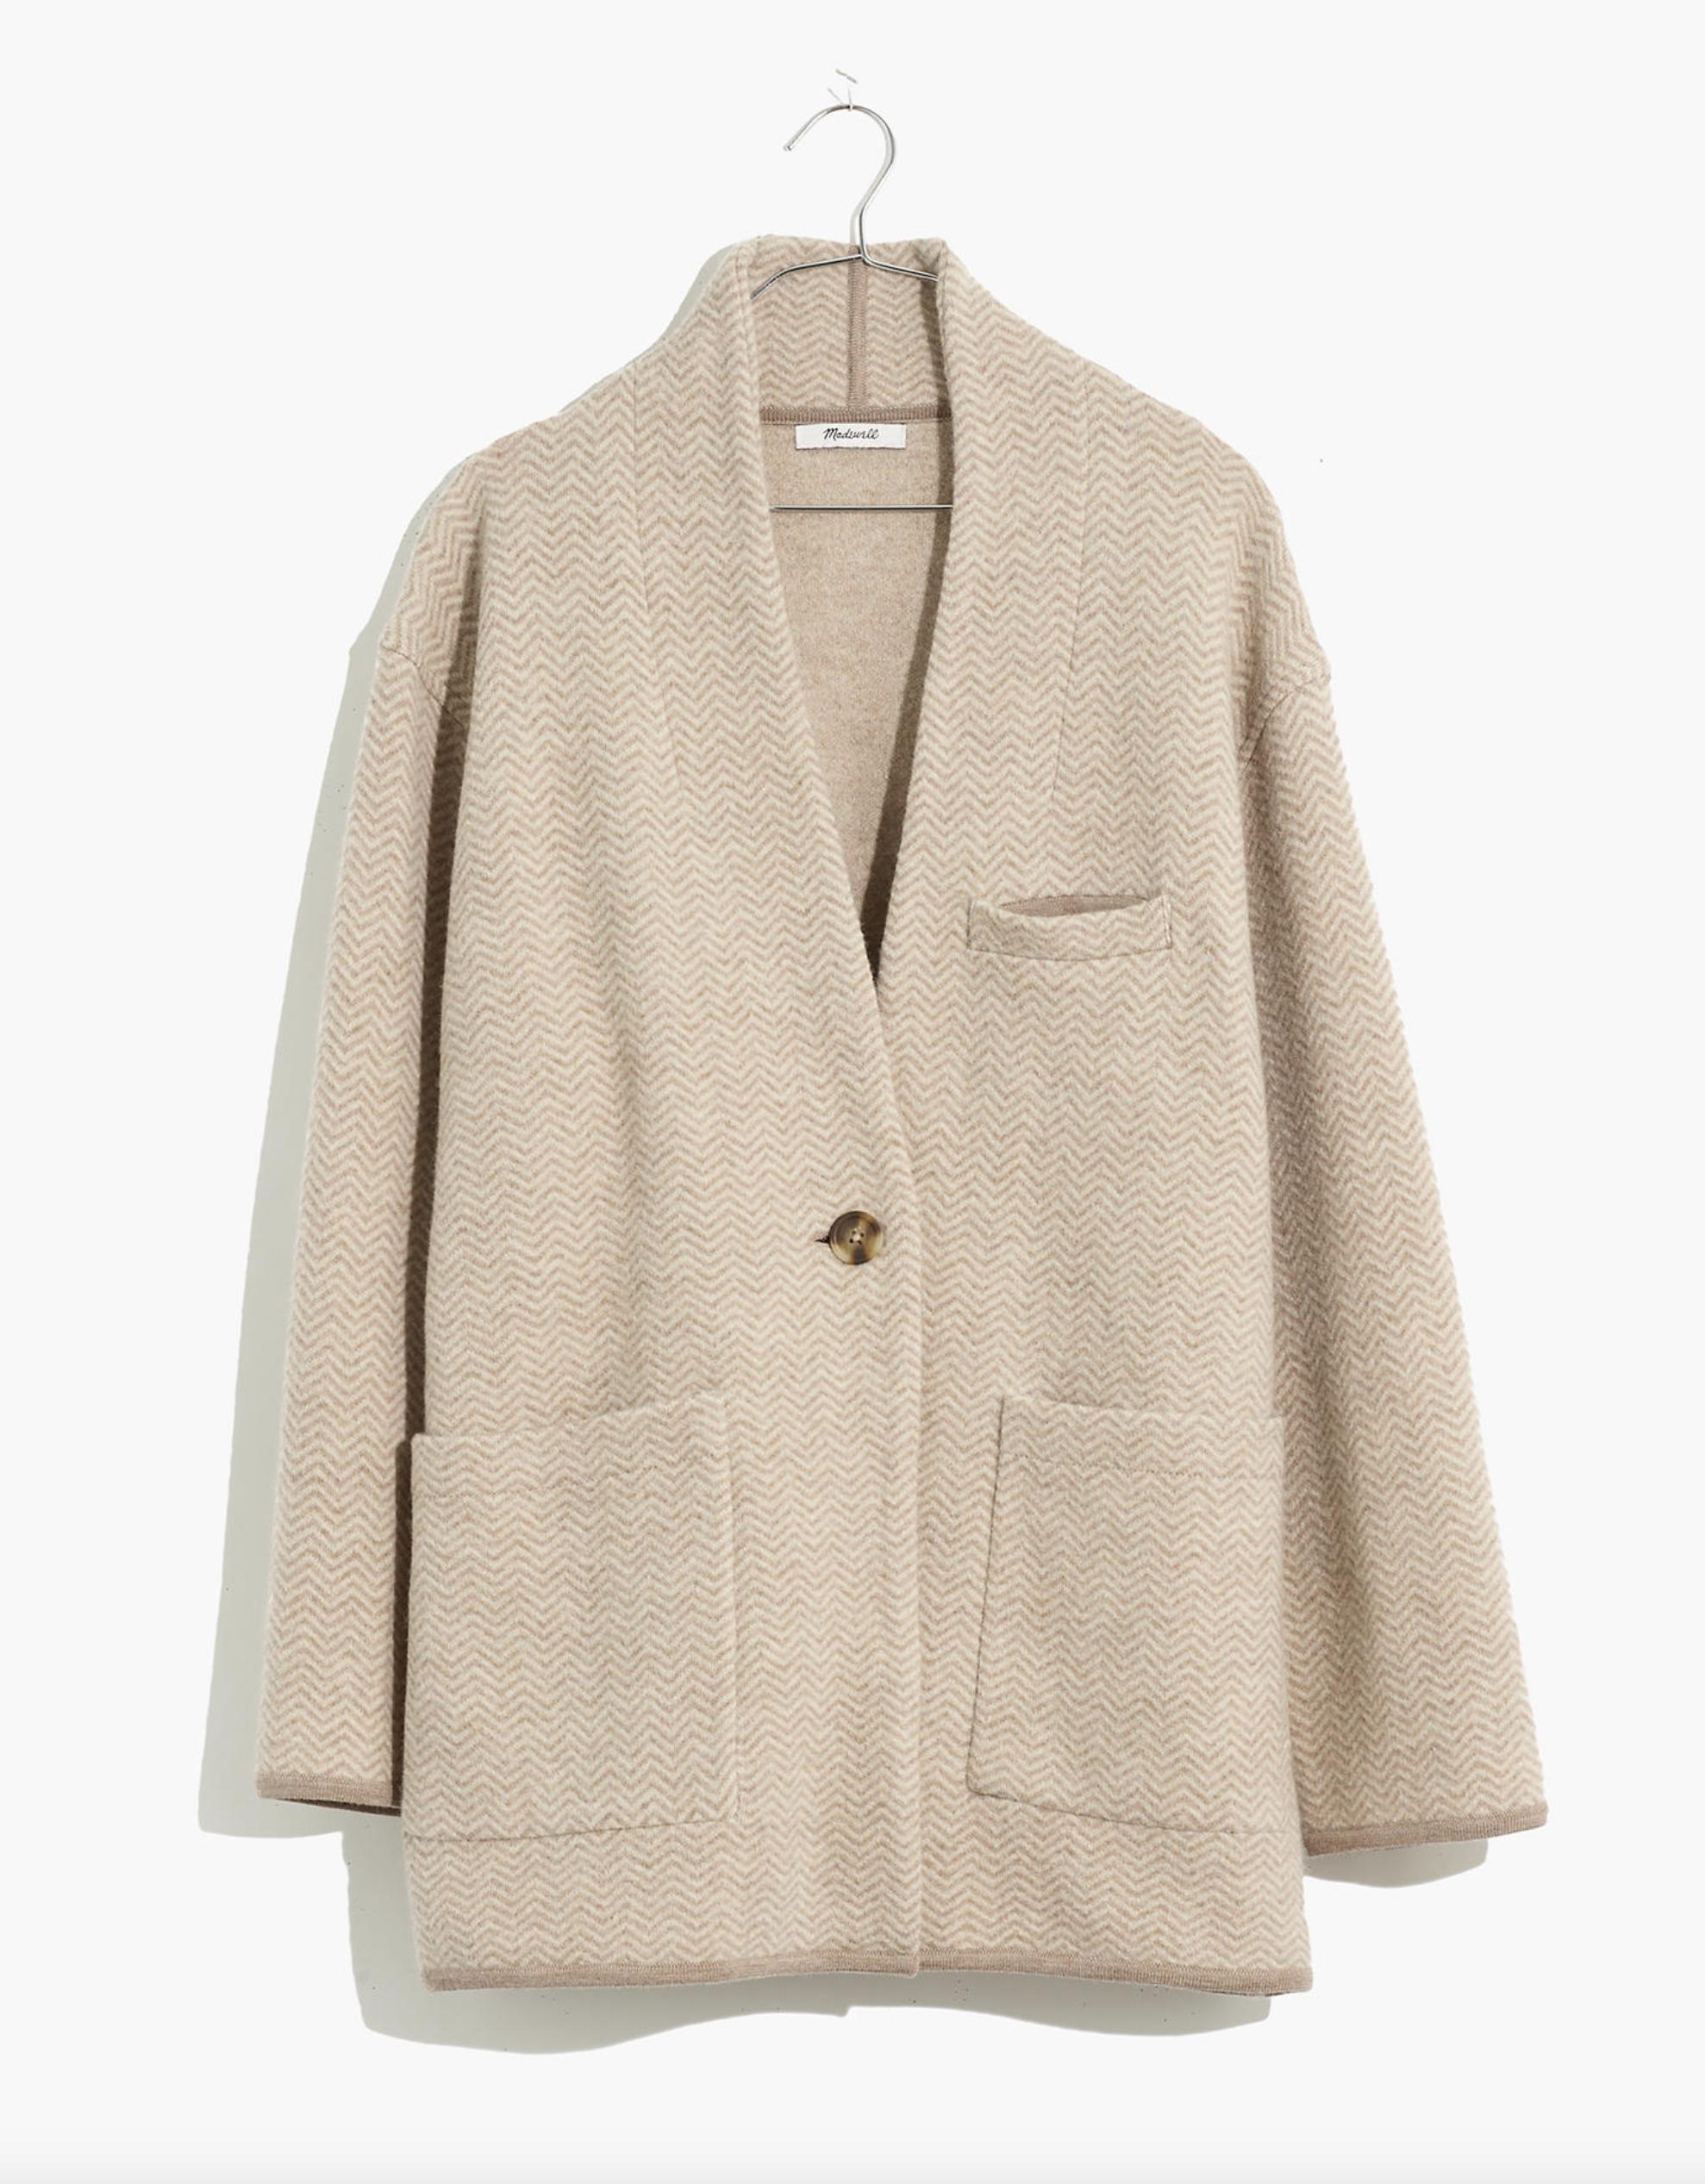 Recent Finds, 1/8 The Madewell herringbone coat